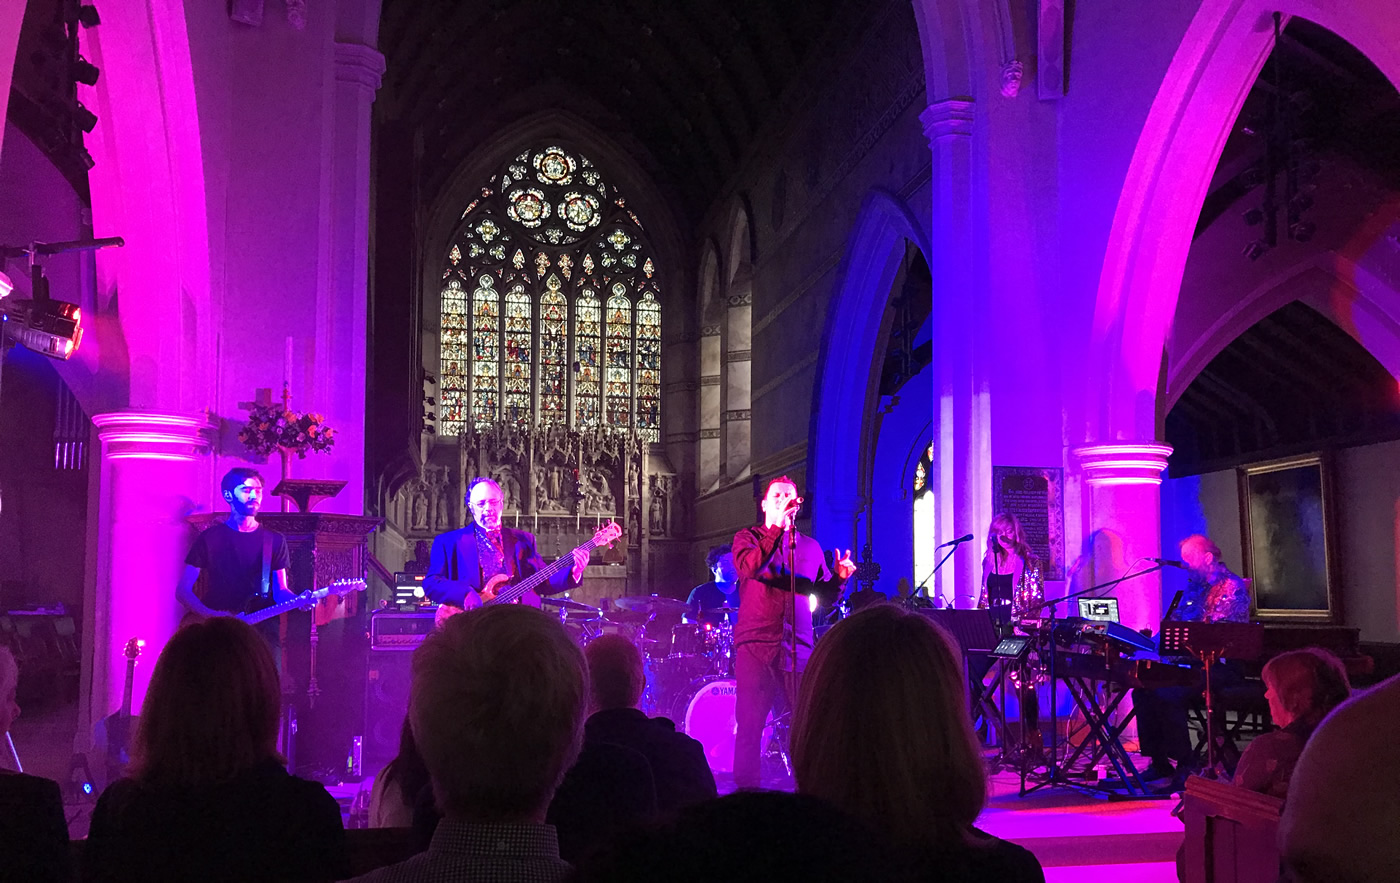 Tribute Band Genesis Legacy Playing in Weybridge Surrey at St James Church